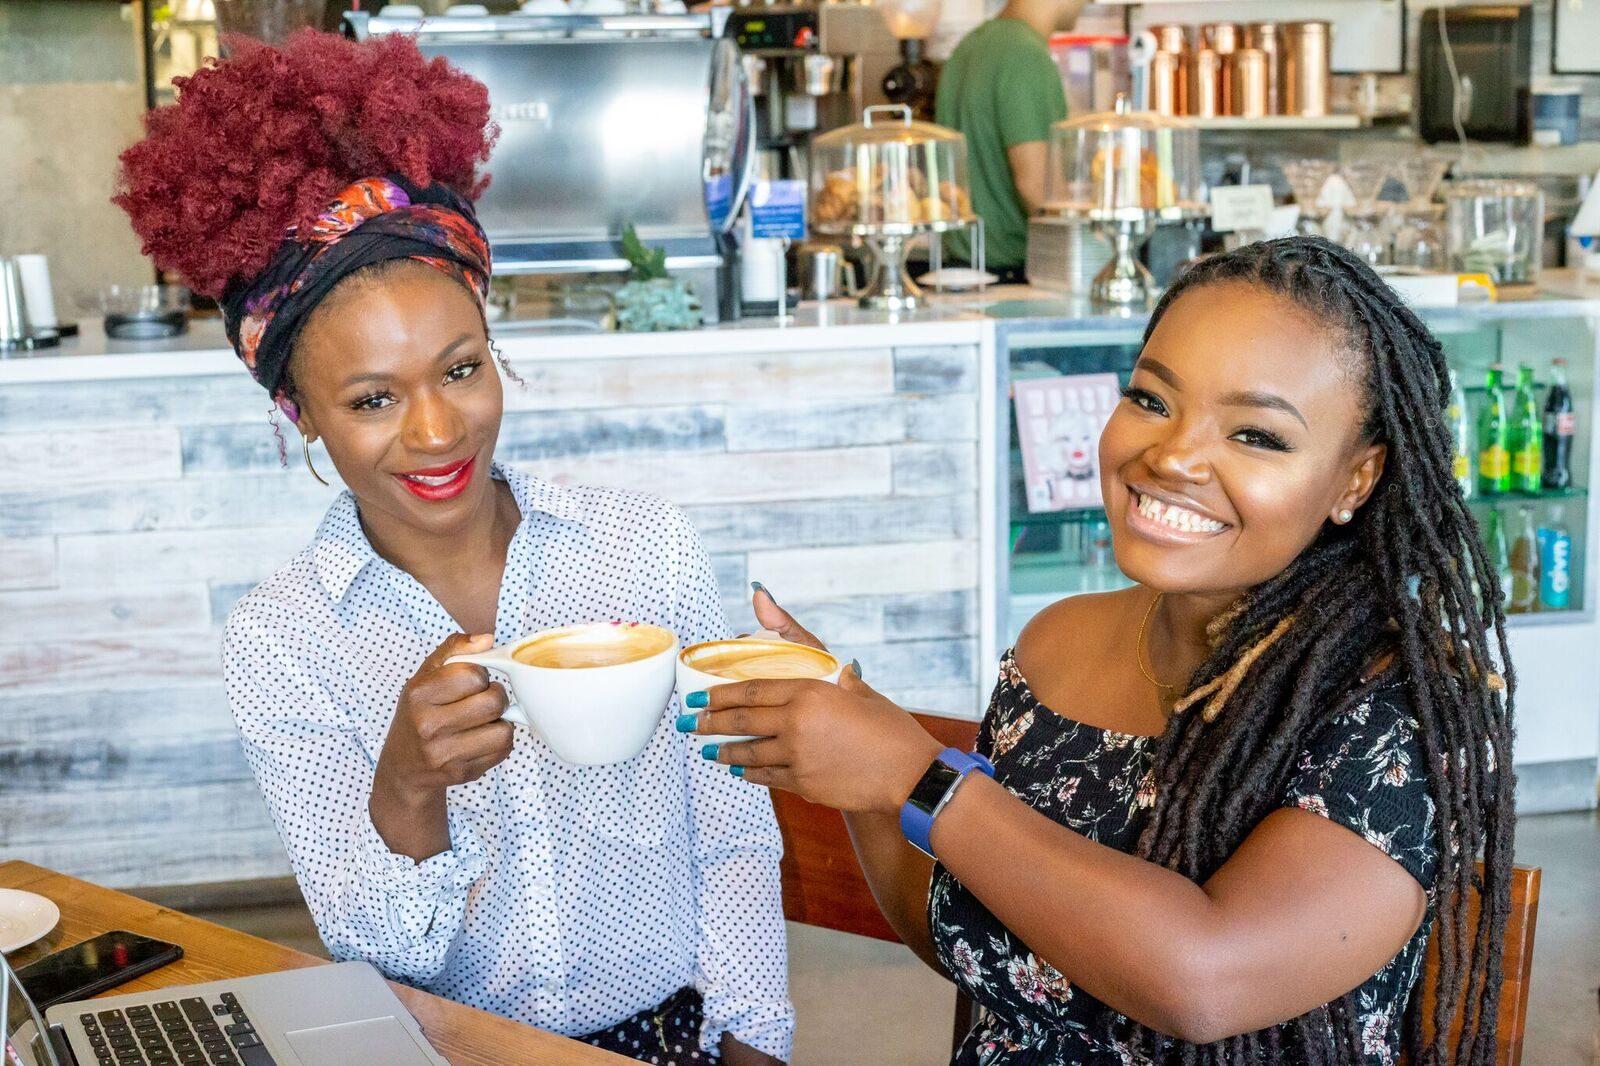 COFFEE WITH PRIIINCESSS: MAMA UNITED BLOG